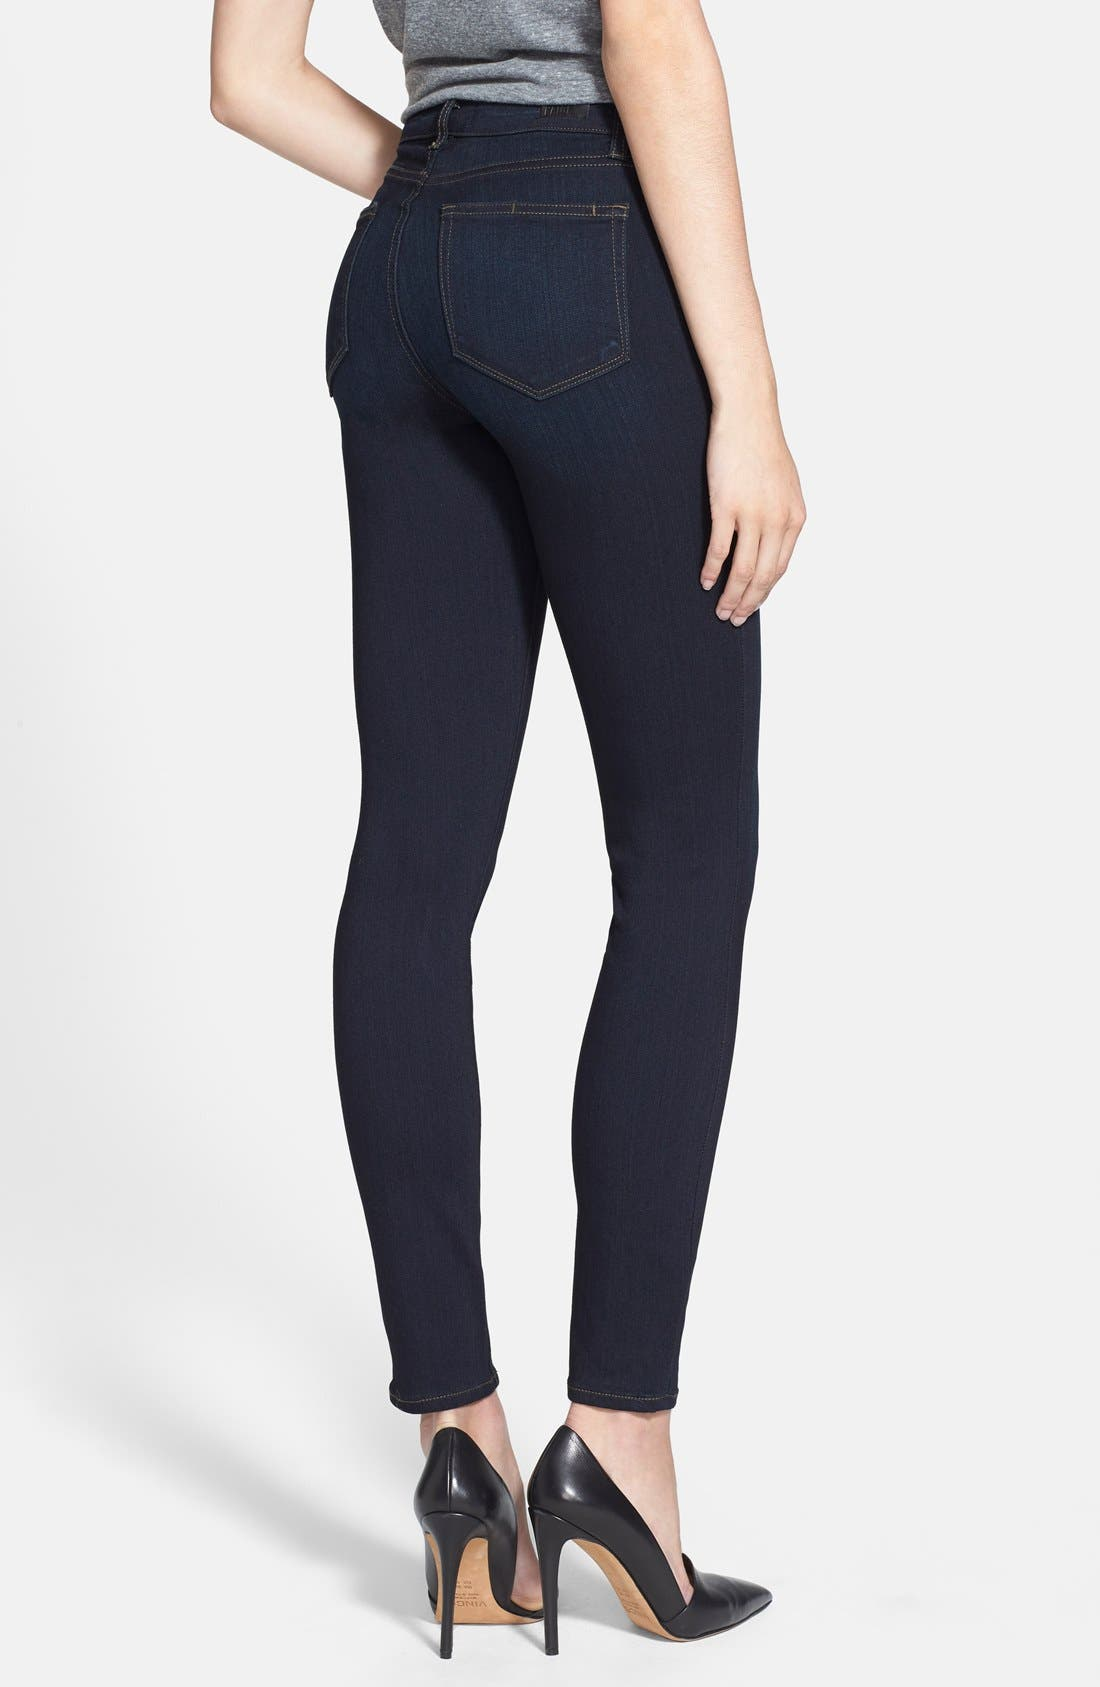 PAIGE, Transcend - Hoxton High Waist Ultra Skinny Jeans, Alternate thumbnail 5, color, MONA